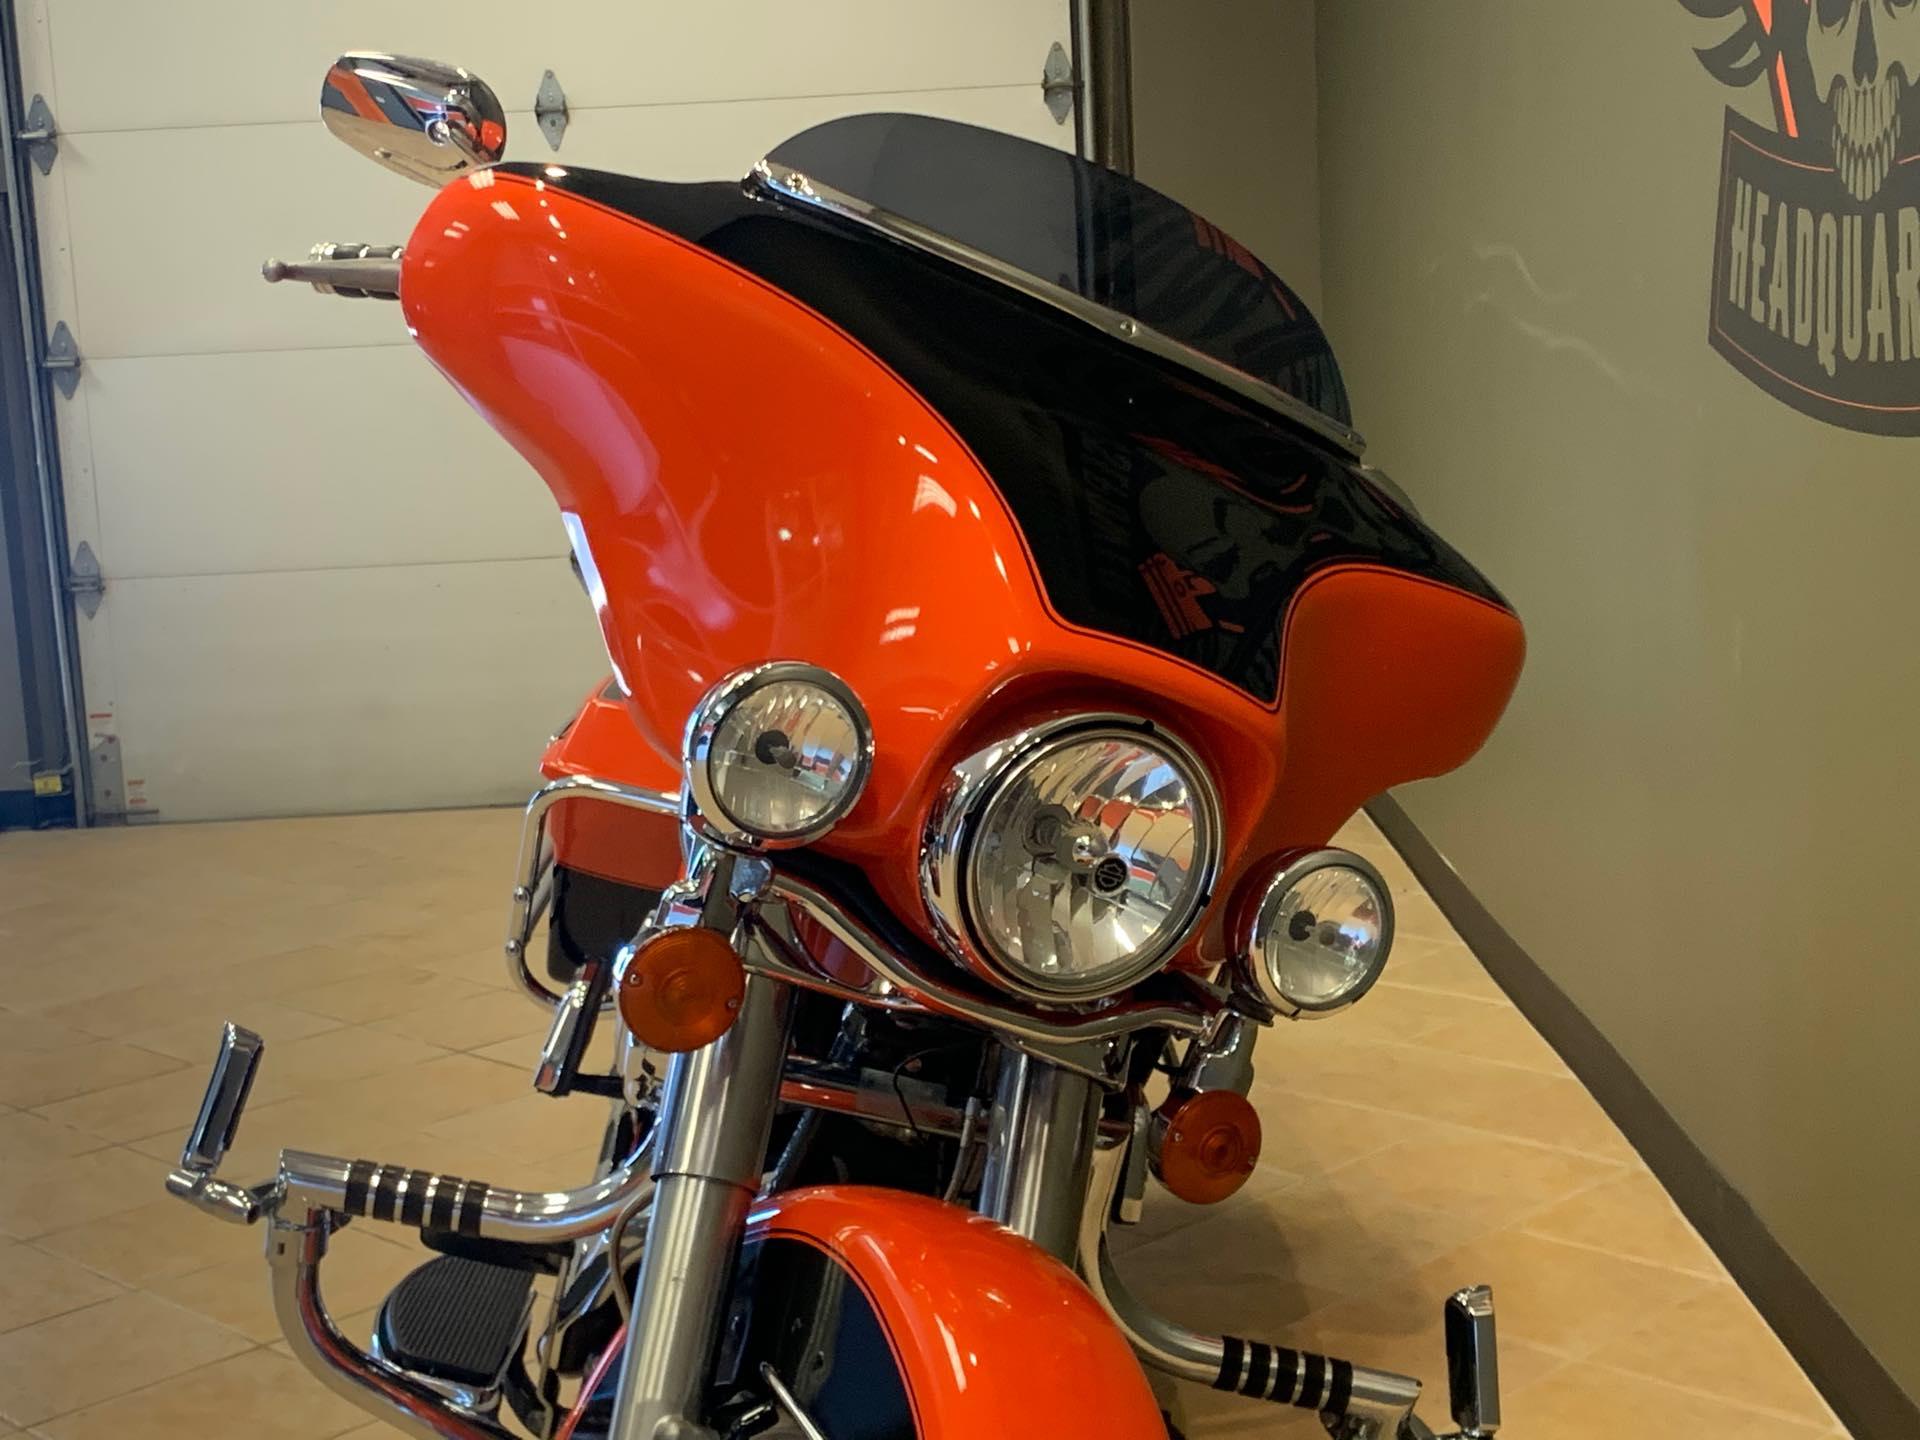 2007 Harley-Davidson Electra Glide Classic at Loess Hills Harley-Davidson